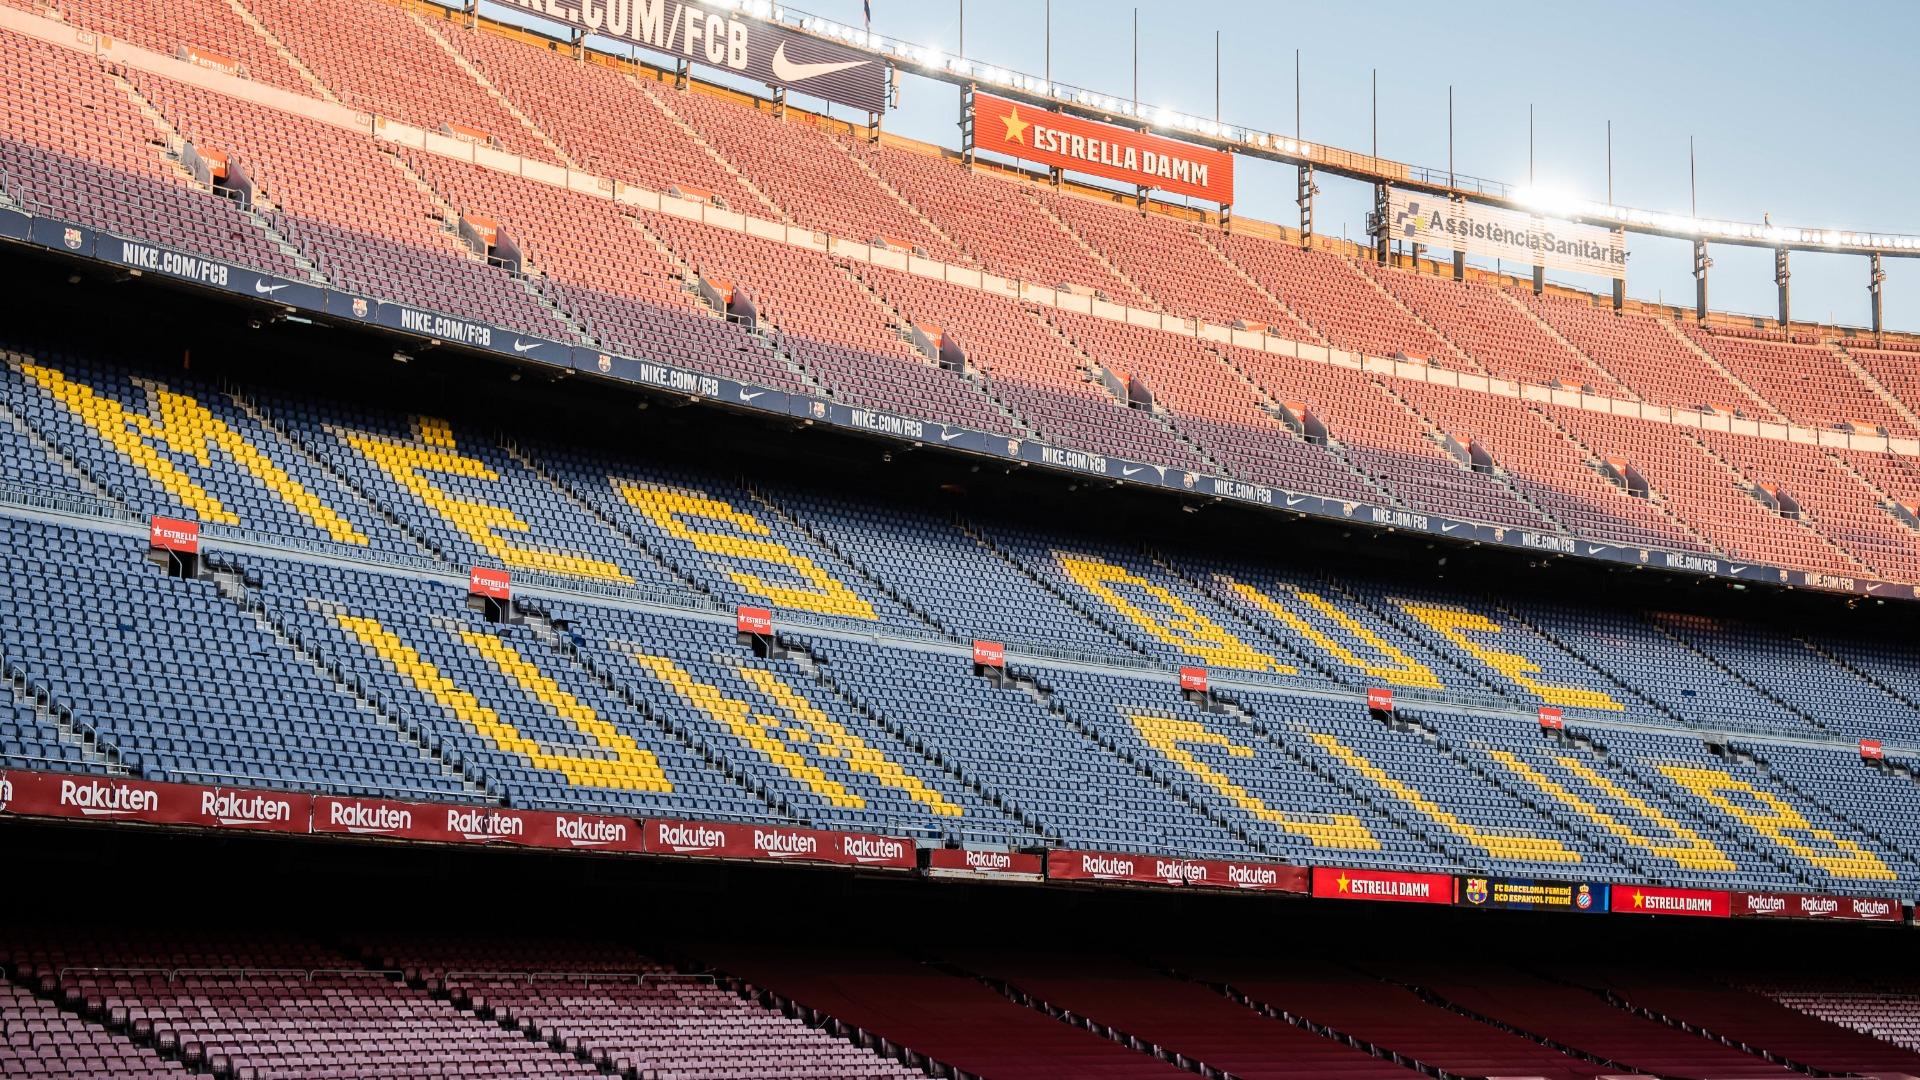 Barcelona ratify January 24 election date despite calls for postponement